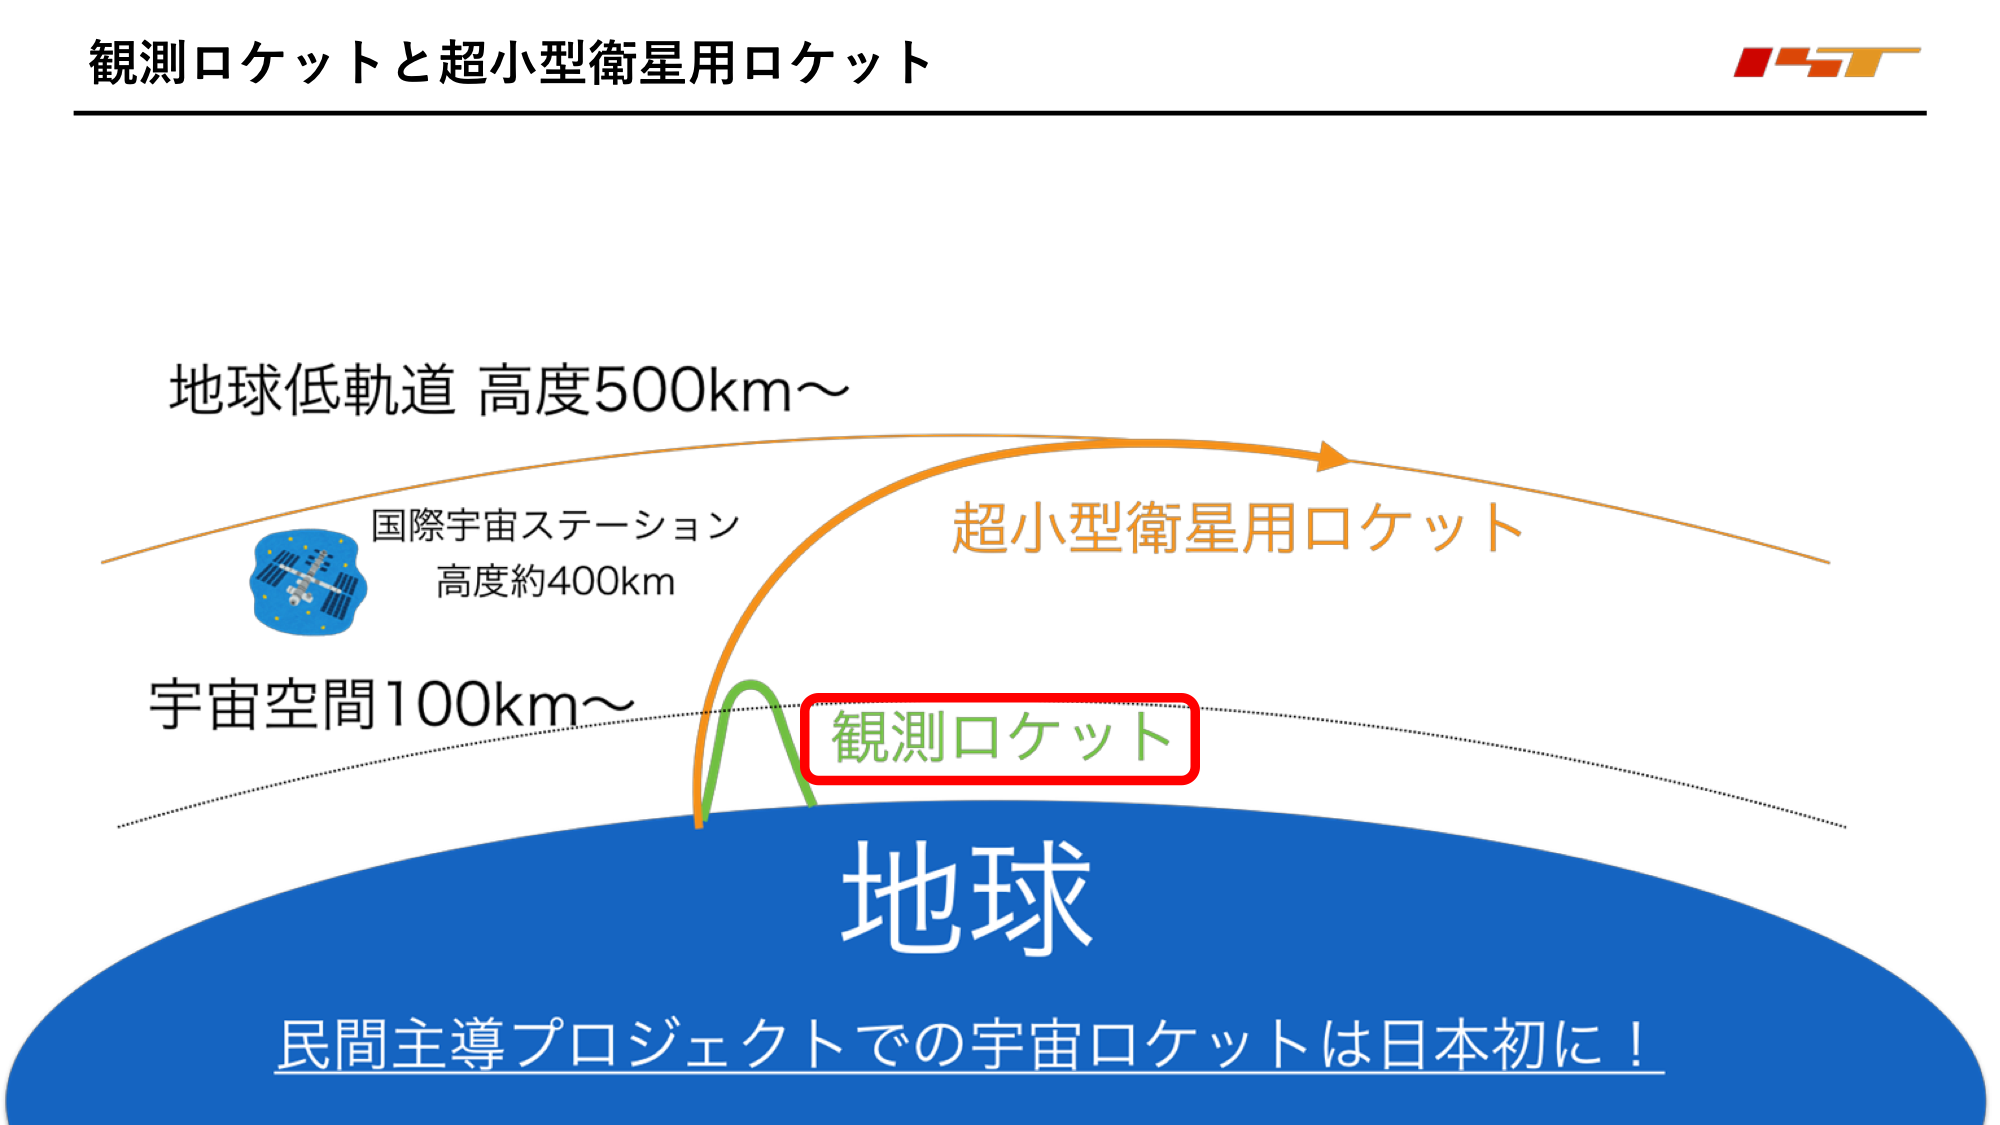 f:id:Imamura:20190628161004p:plain